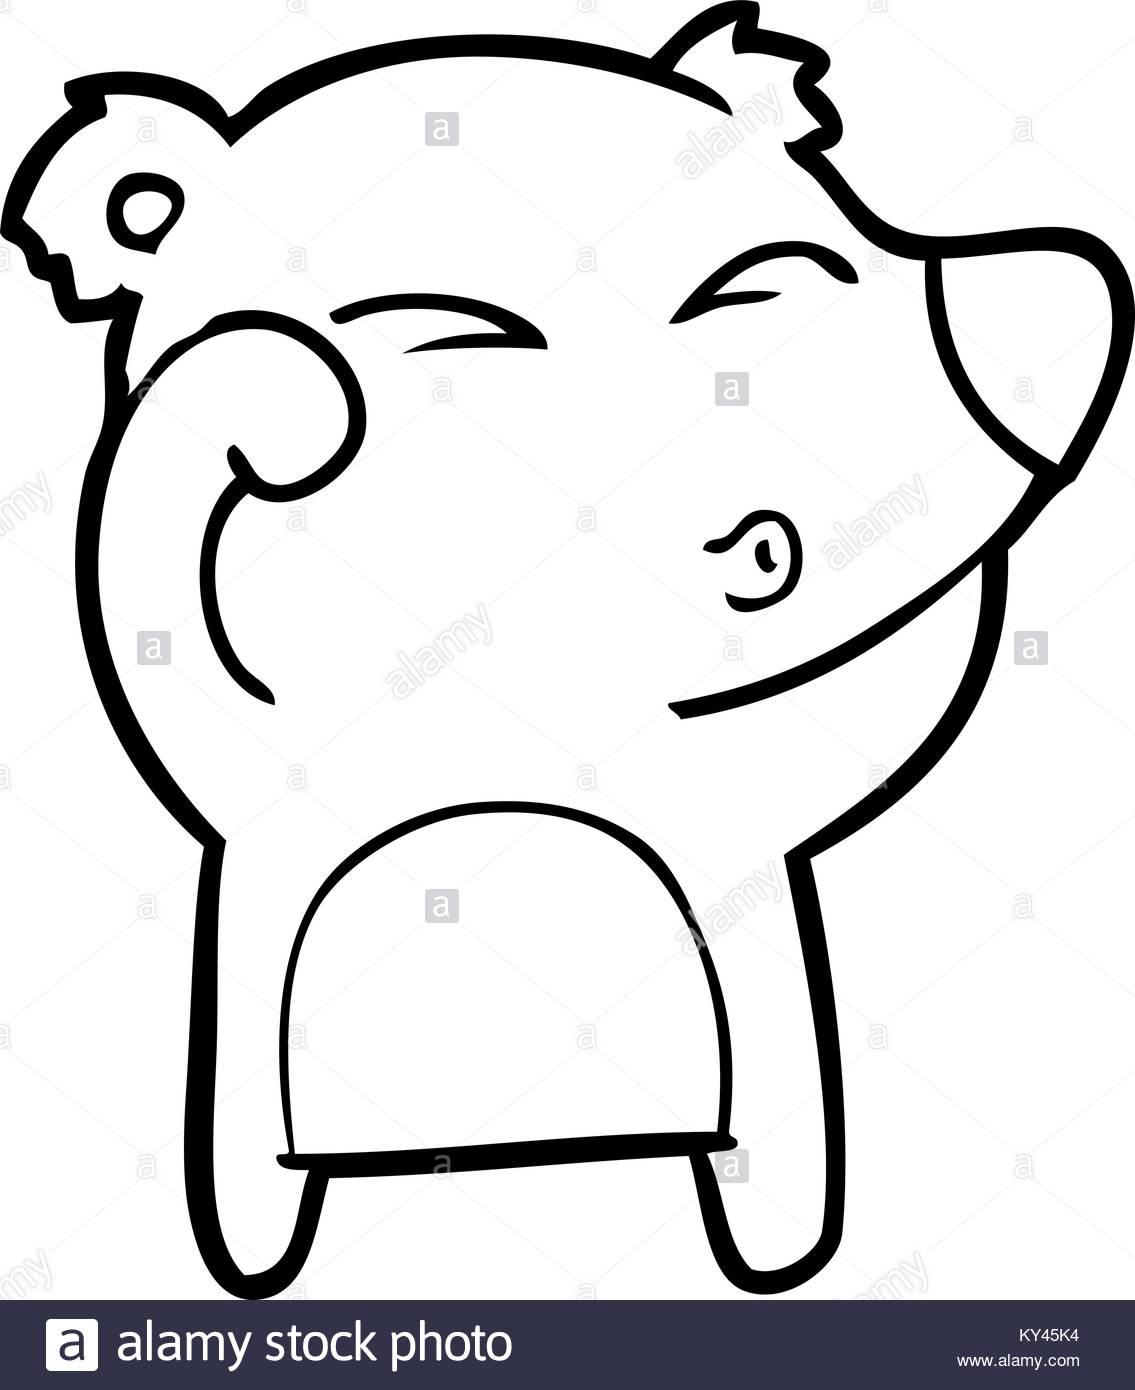 1135x1390 Cartoon Tired Bear Rubbing Eyes Stock Vector Art Amp Illustration